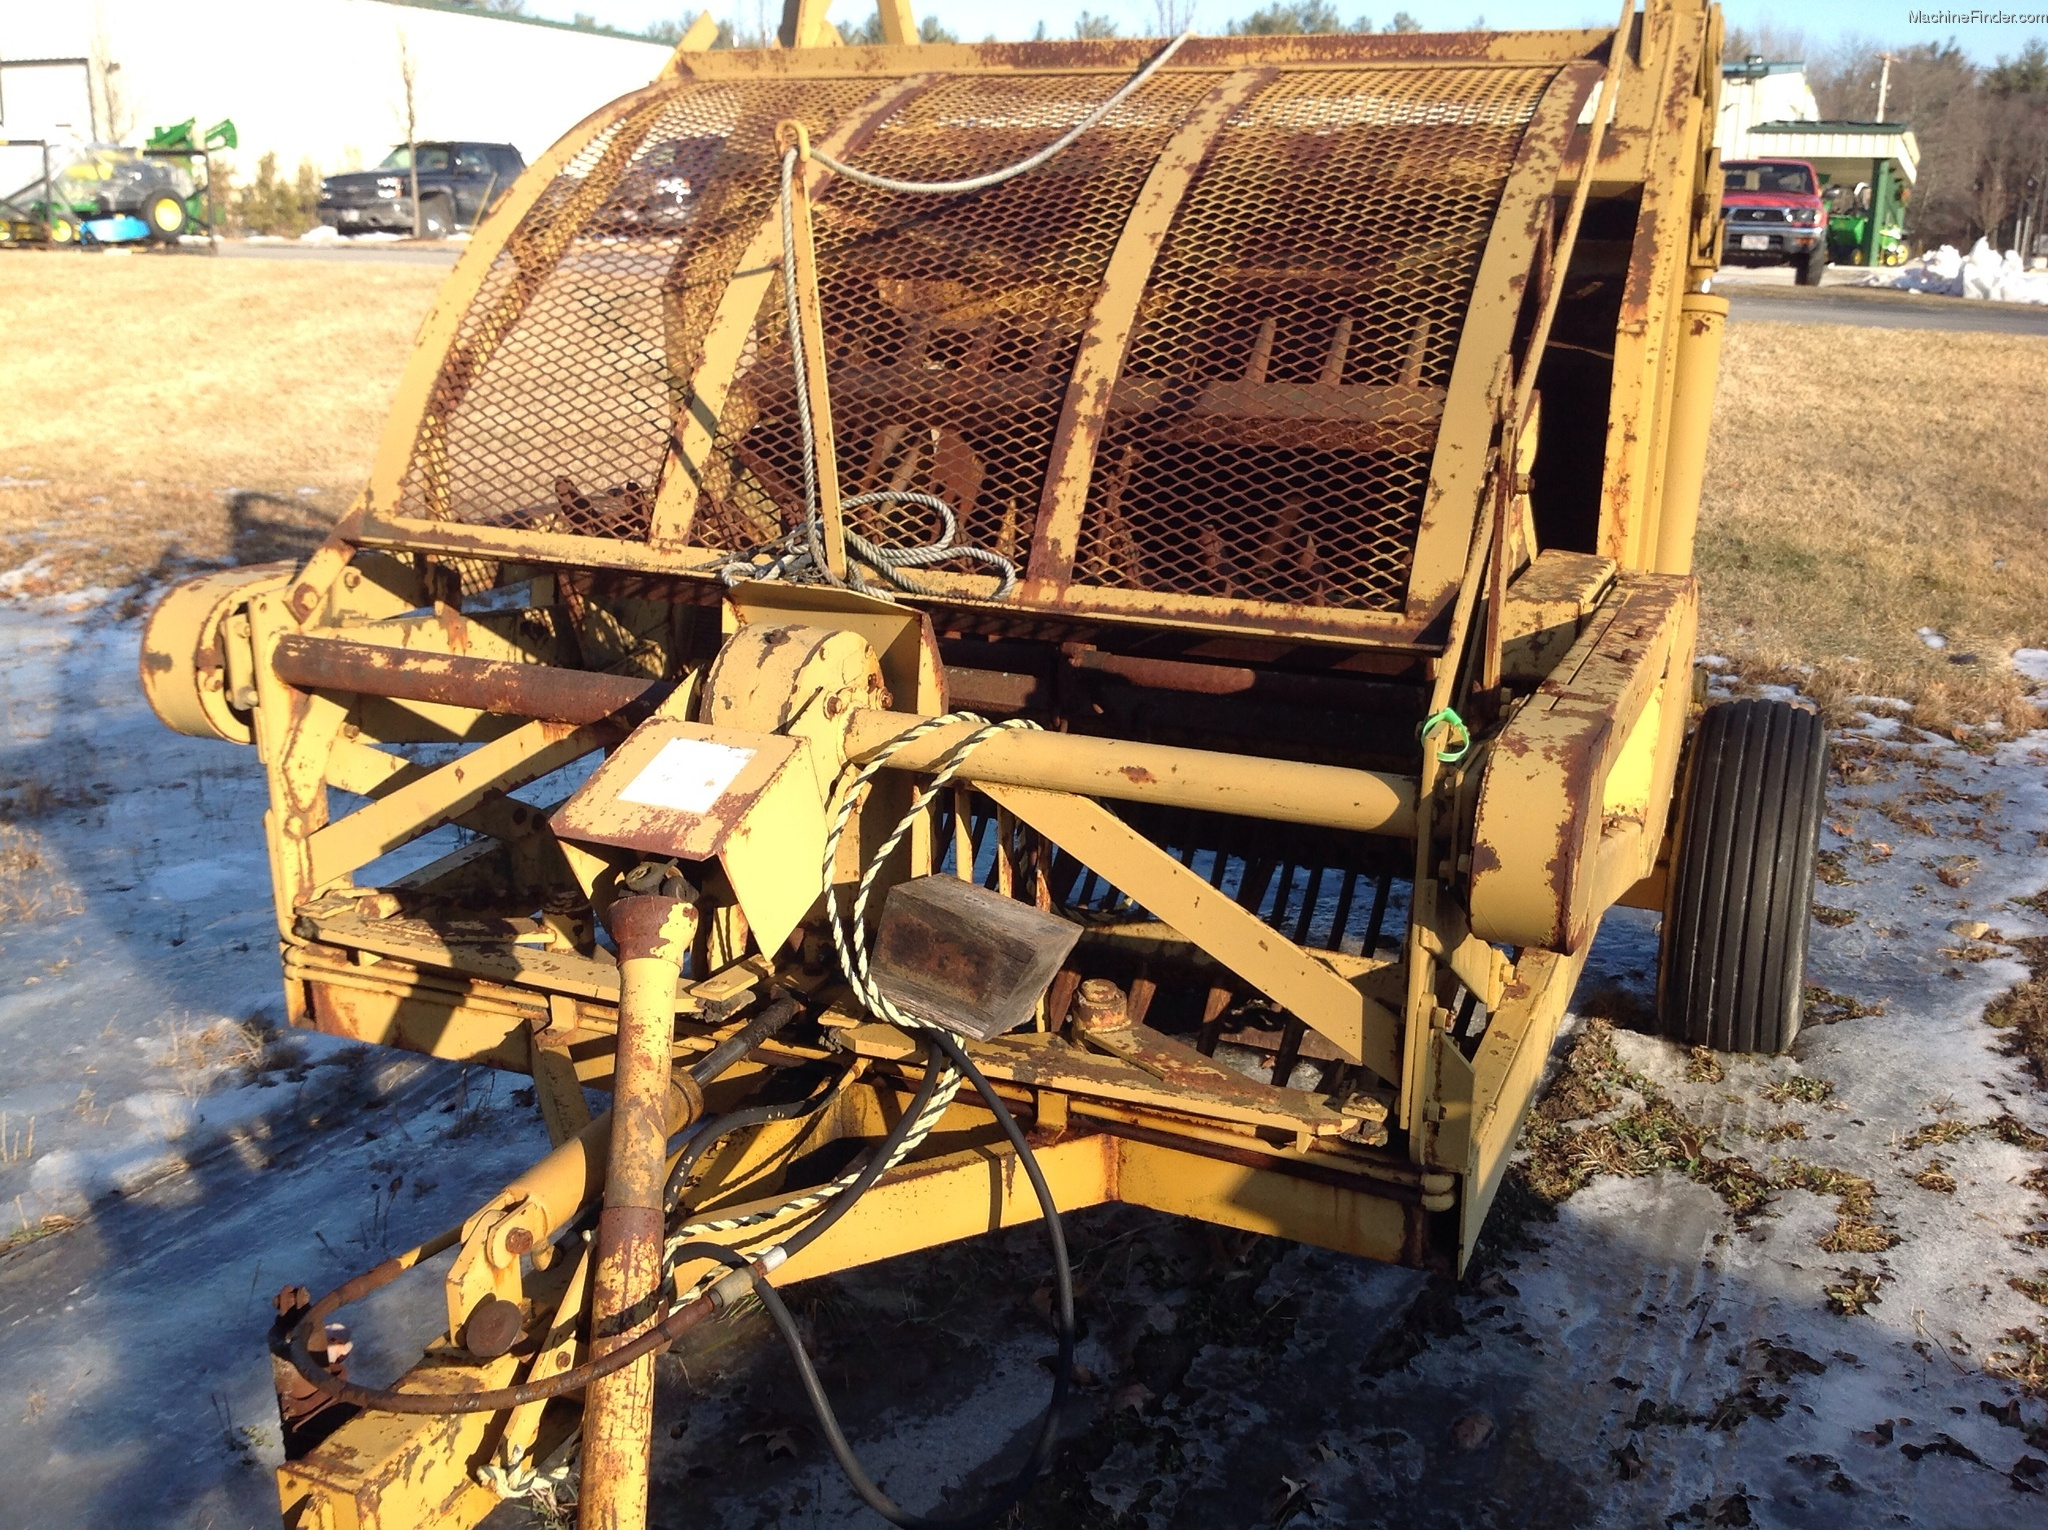 Rock Picking Machines : Anderson rock picker miscellaneous john deere machinefinder